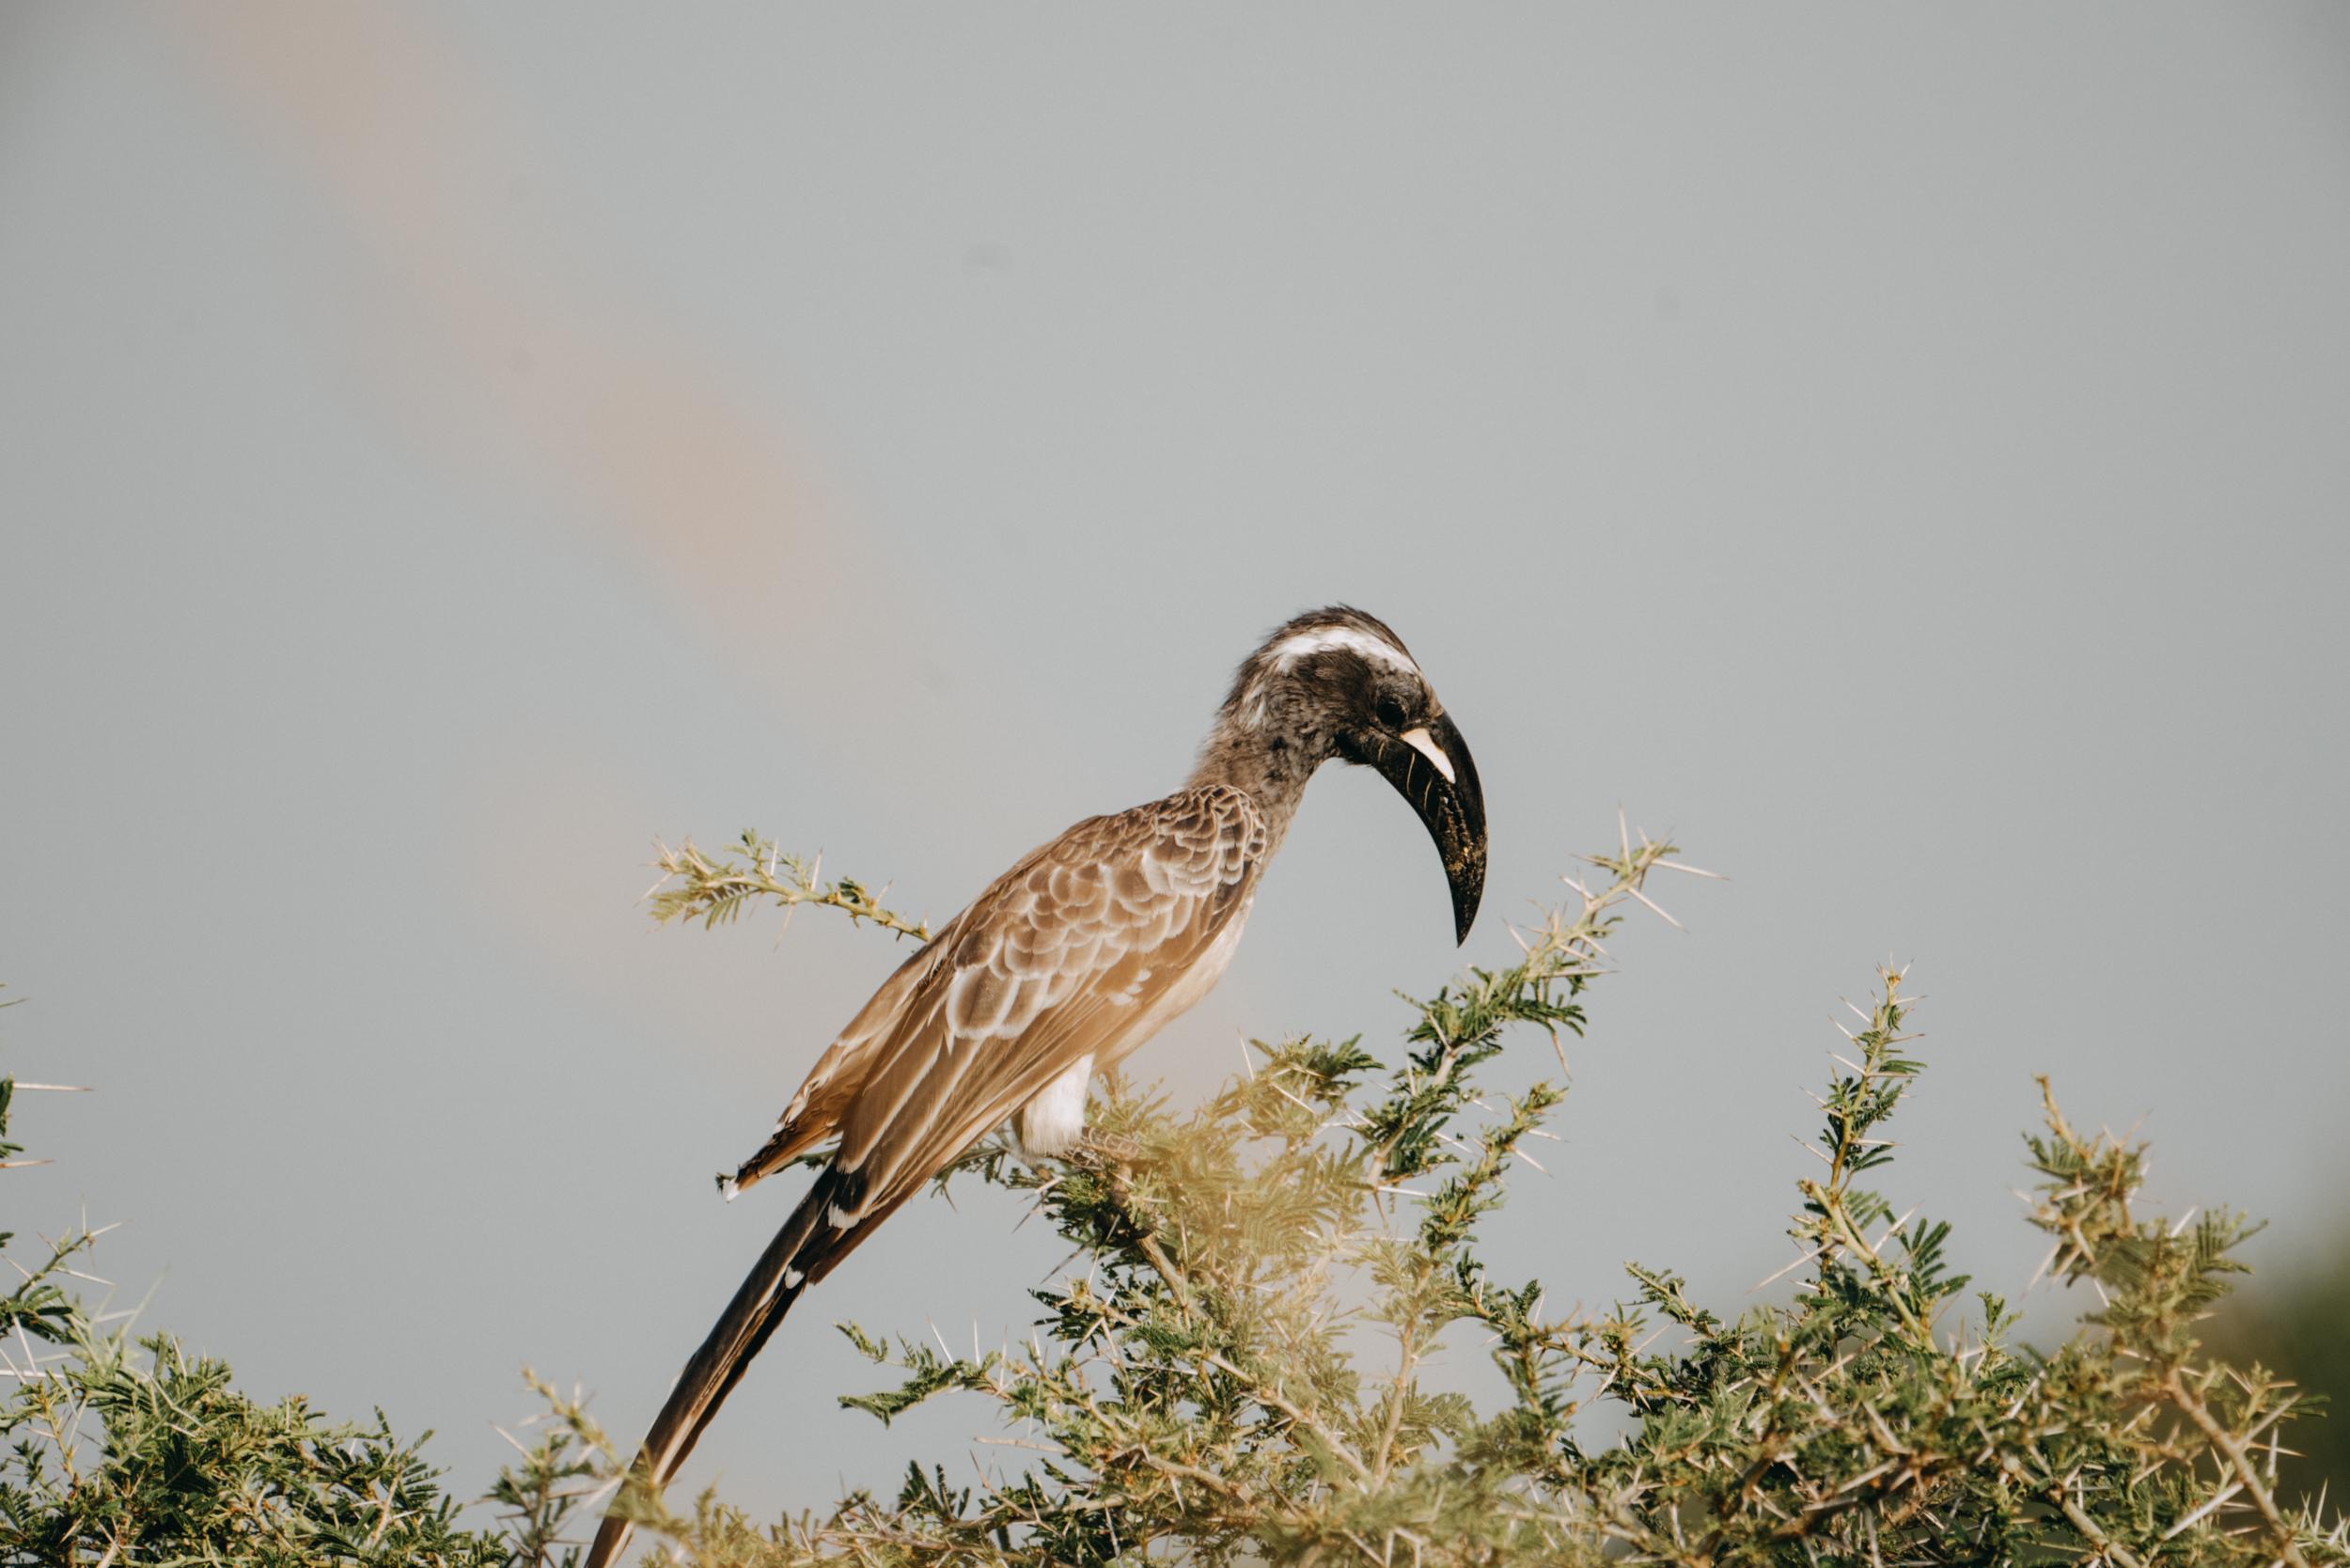 uganda july 2018-249.jpg